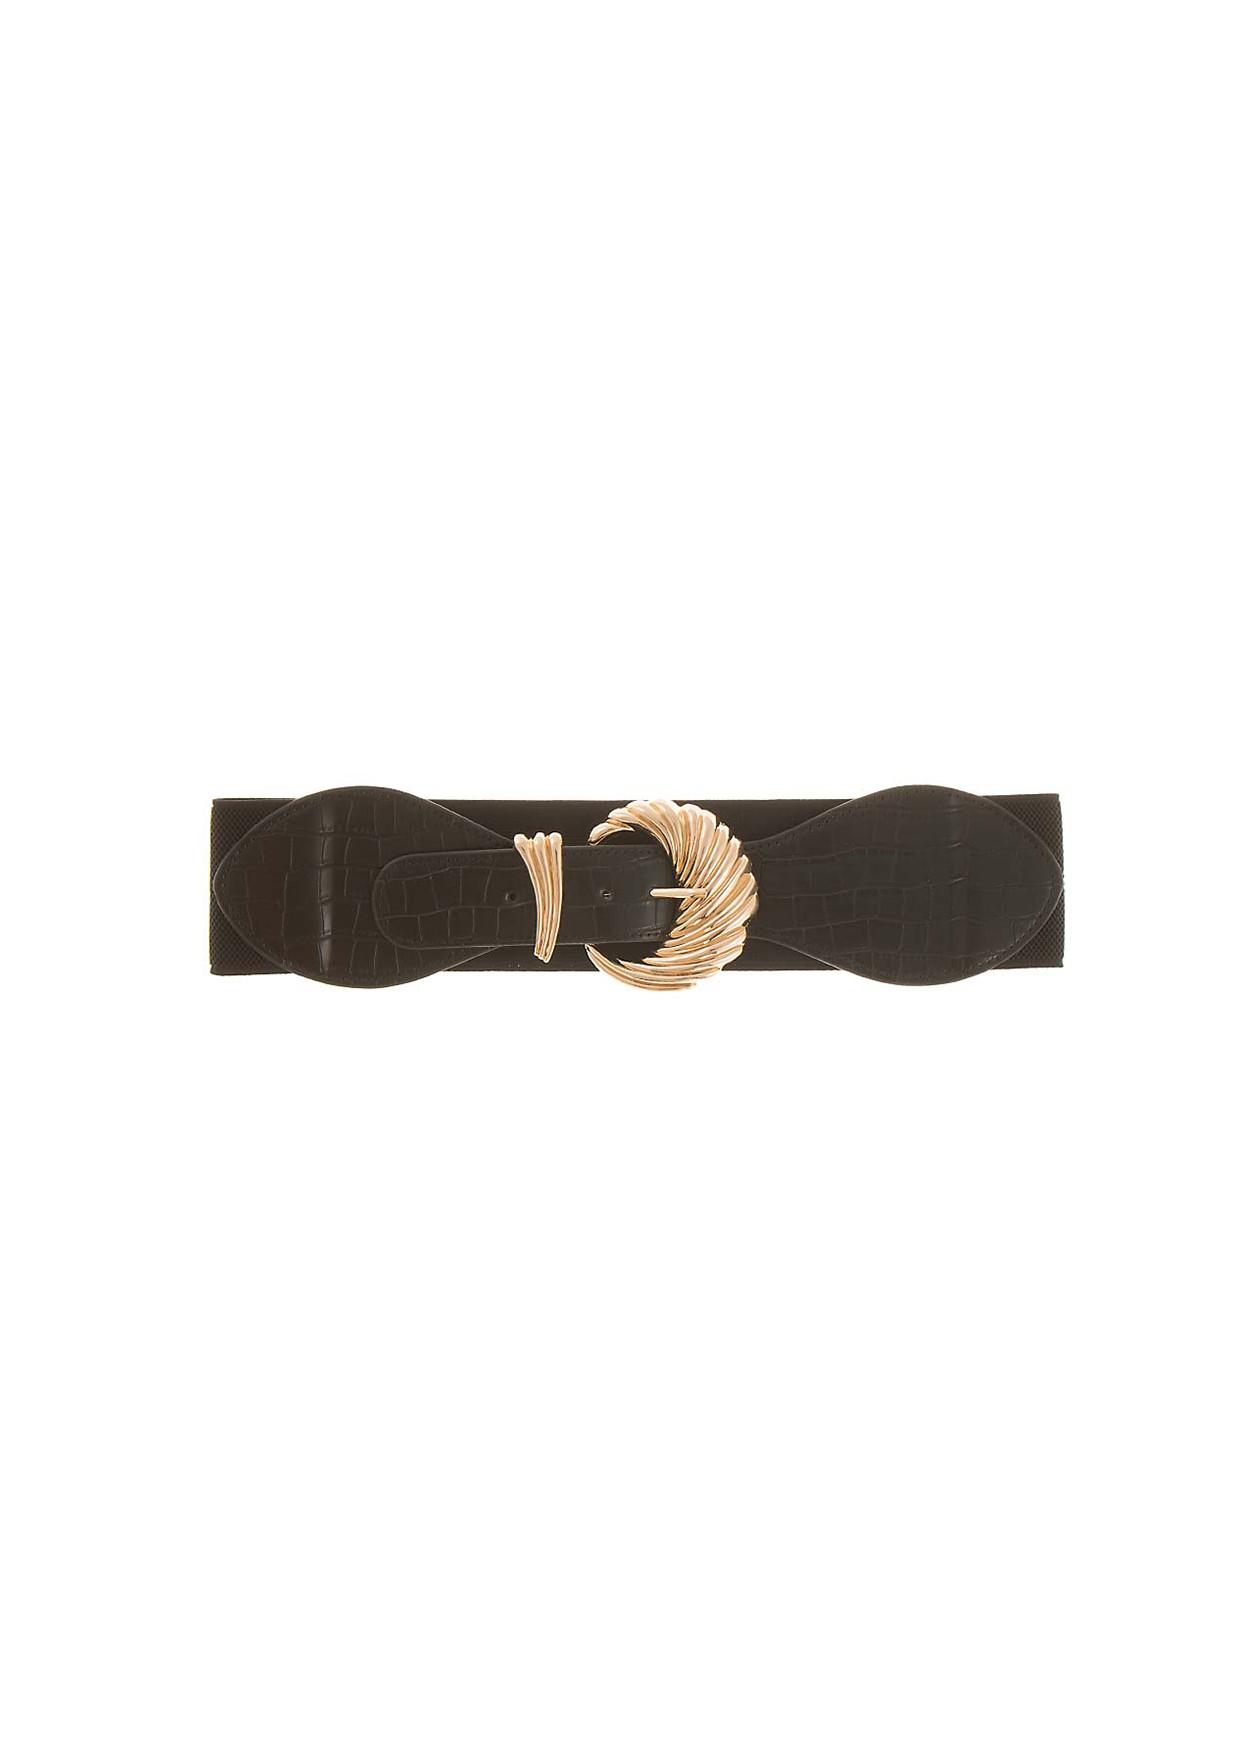 Elastic waist with gold buckle